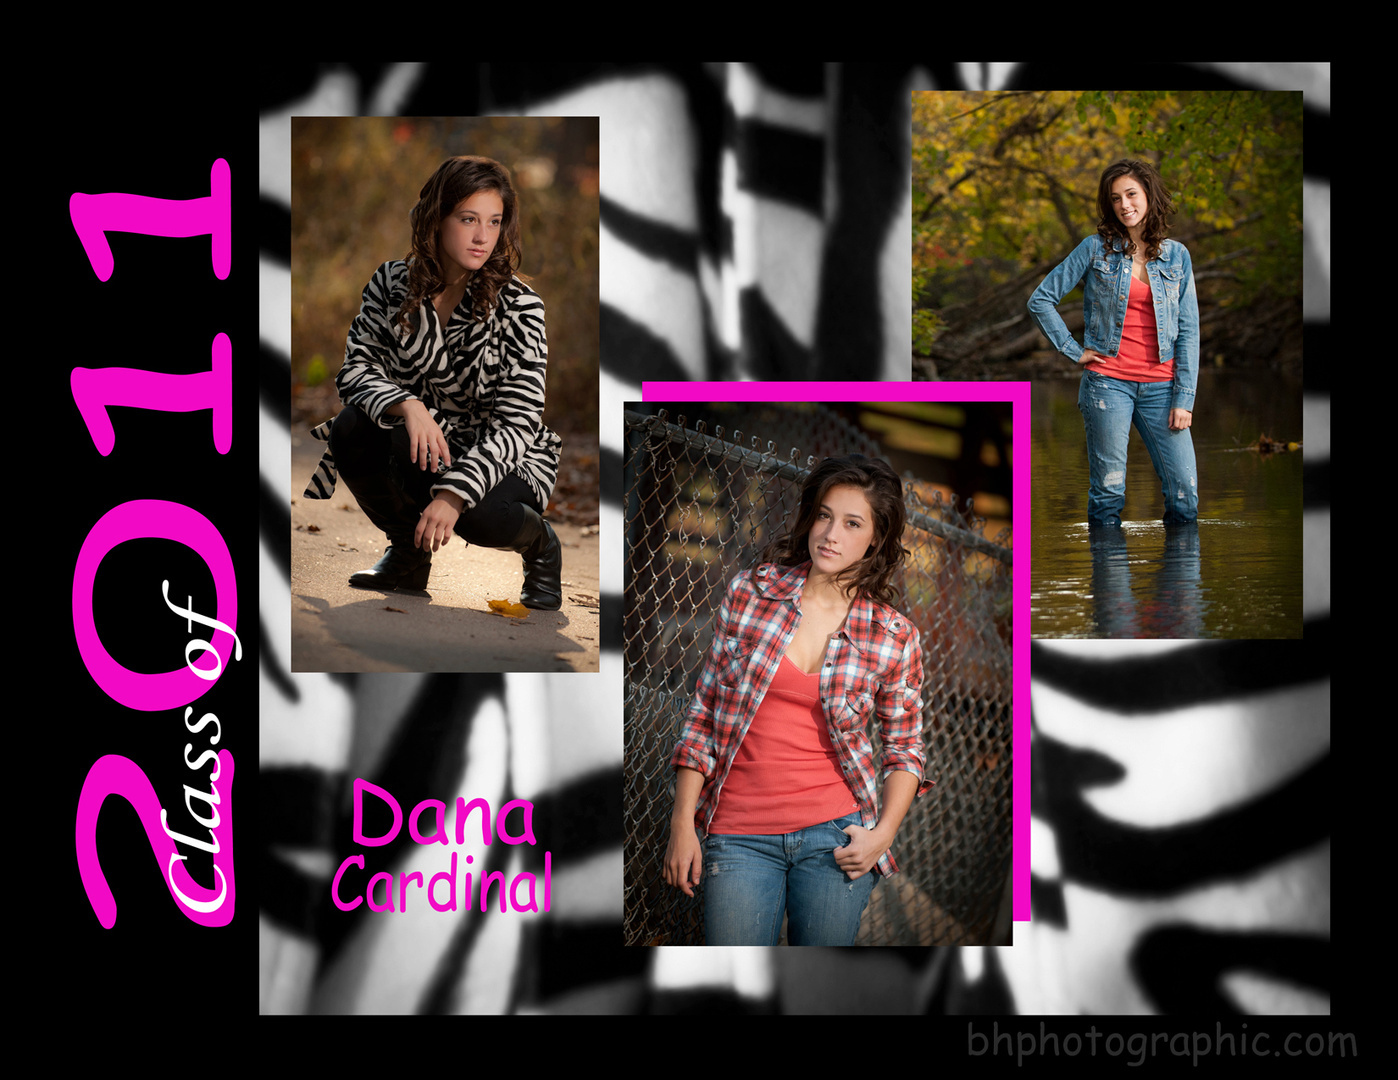 change image  5-14-11 ...jpg